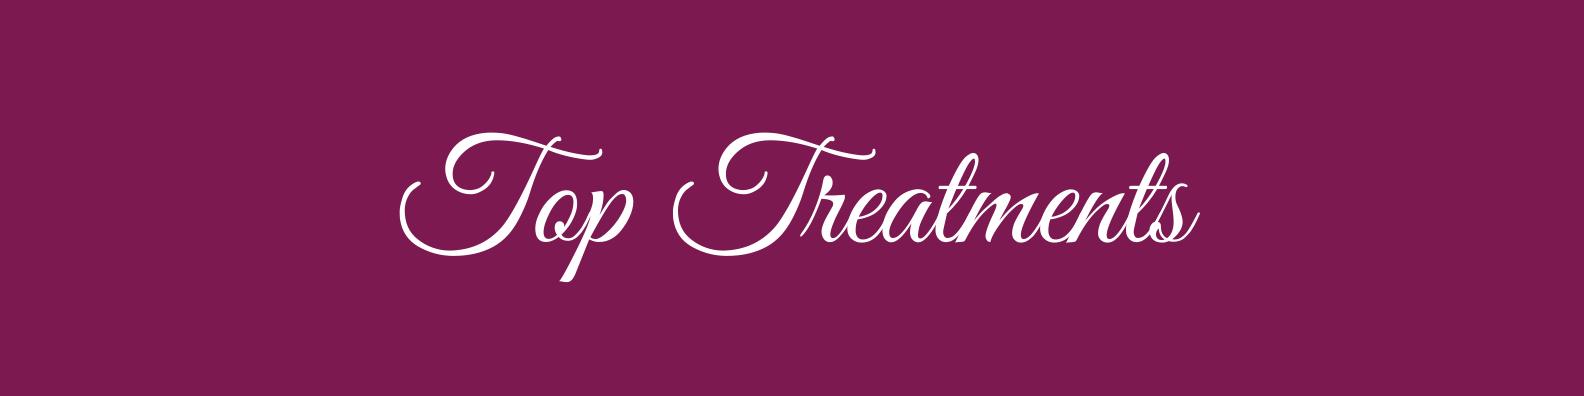 Top Treatments Logo